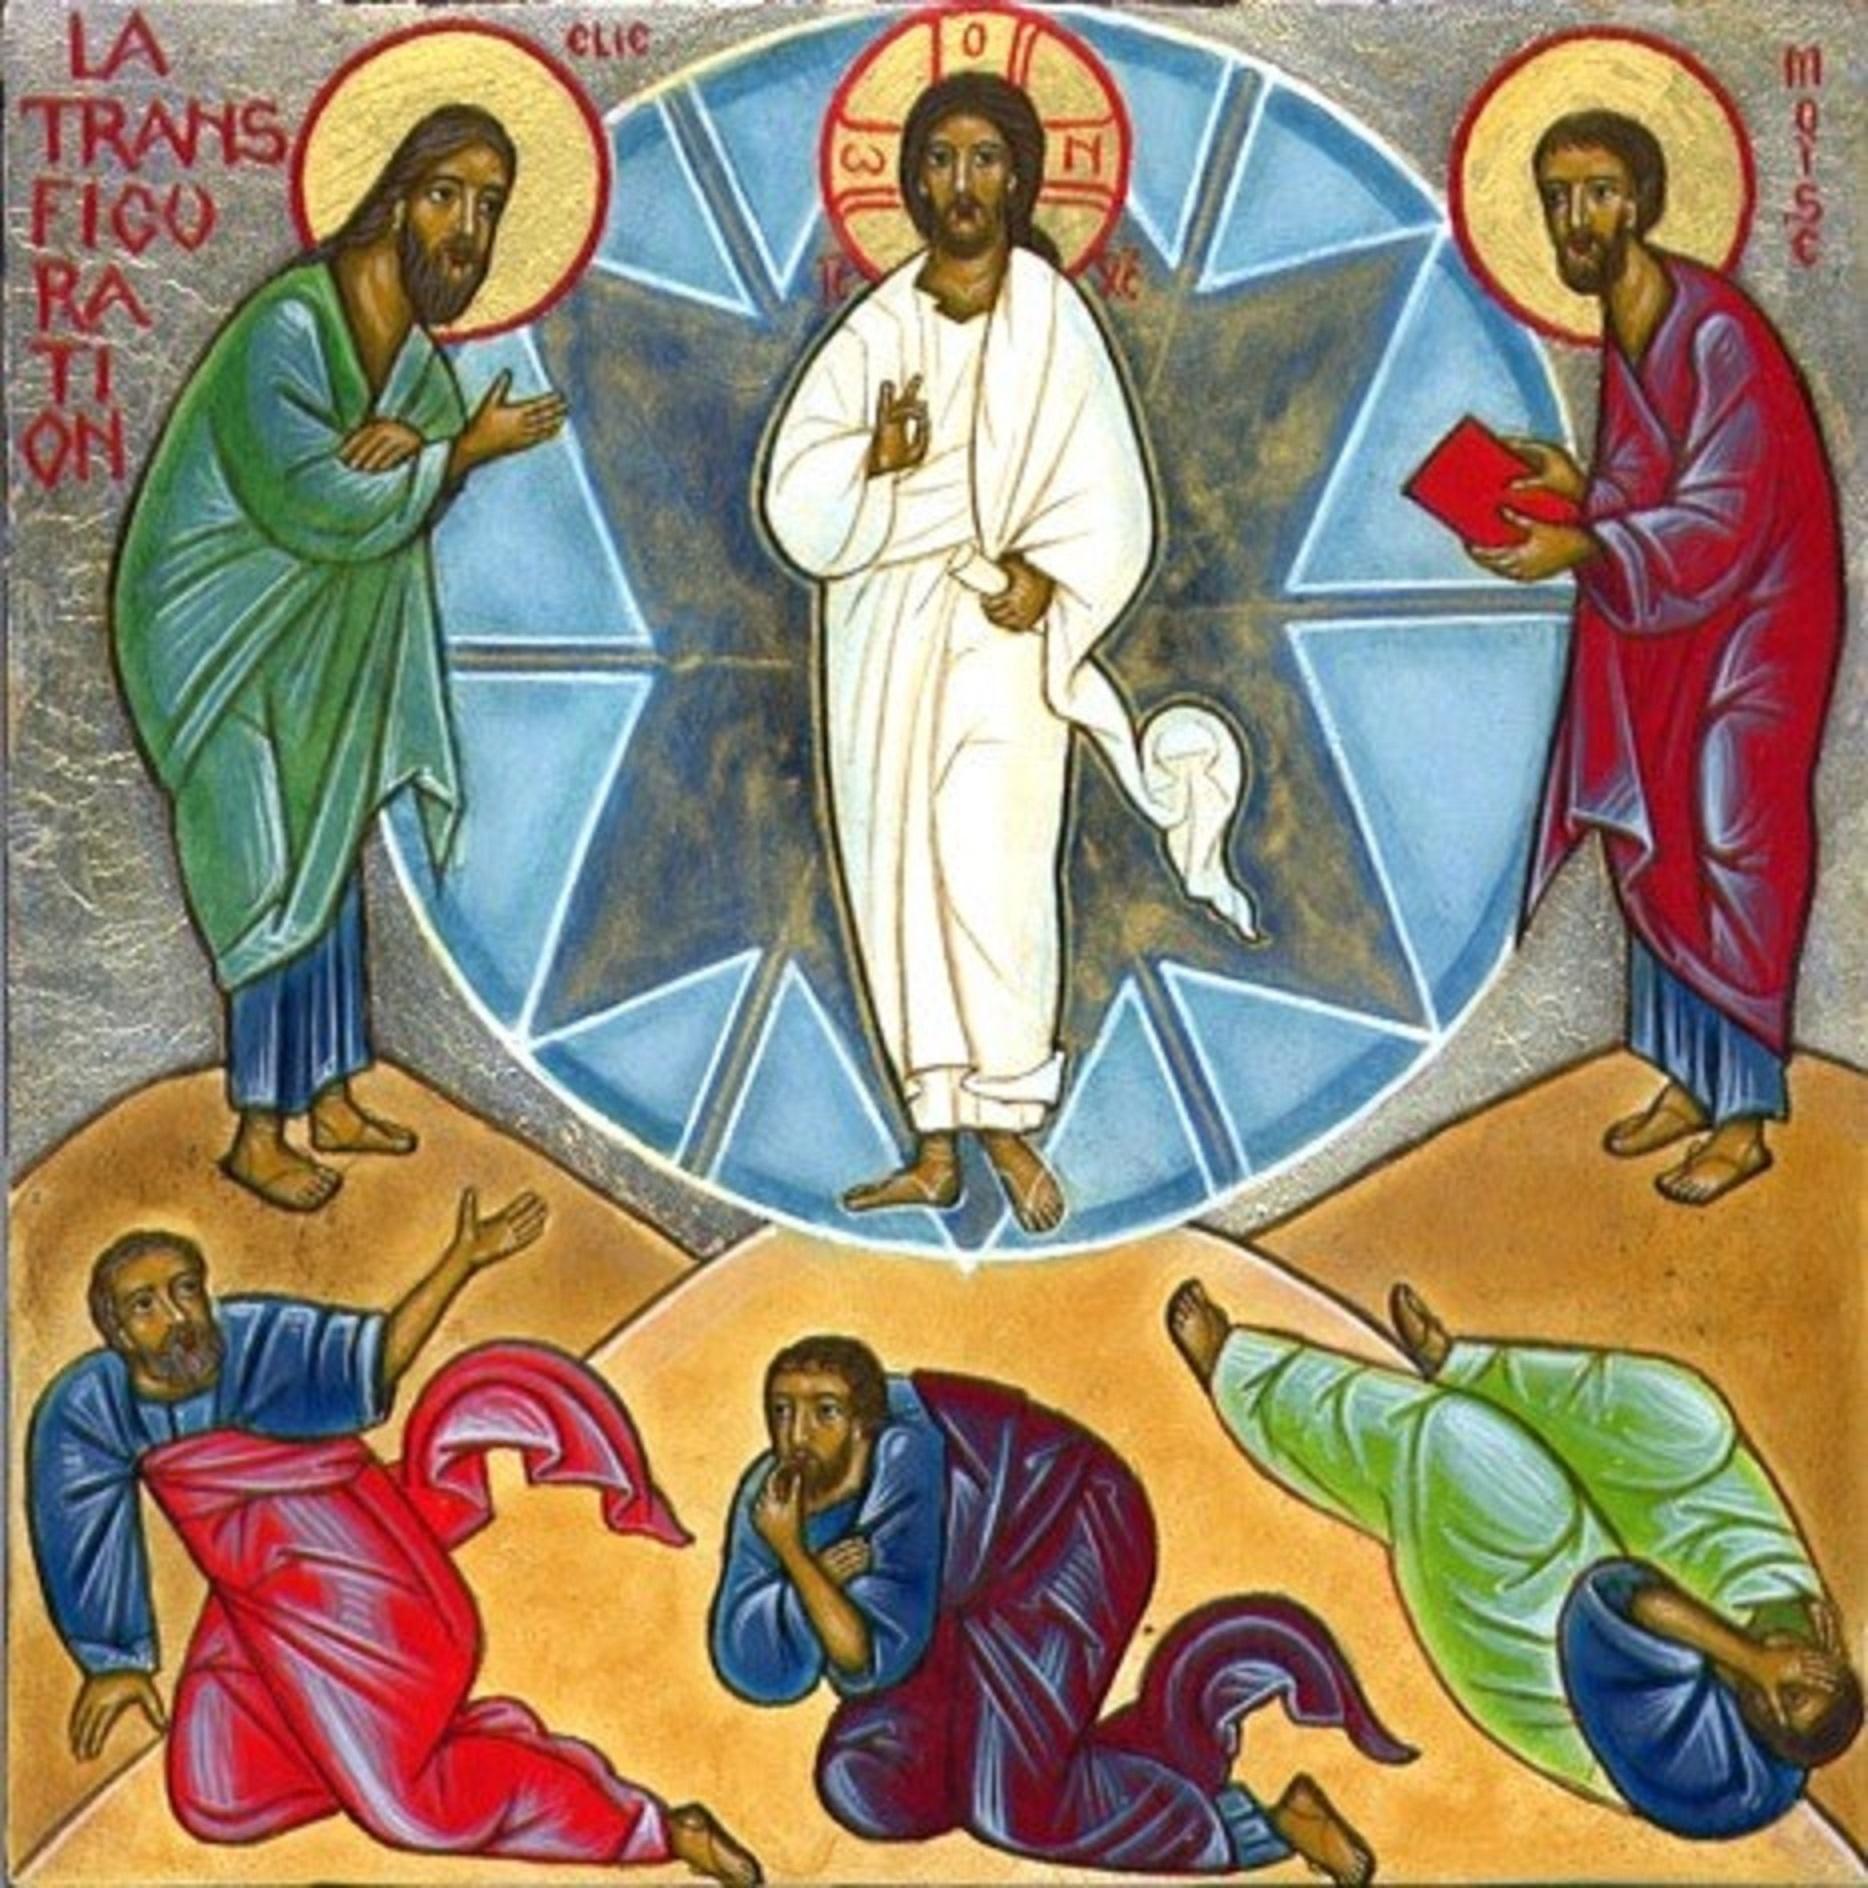 Transfiguration de Jésus 2017 1.jpg